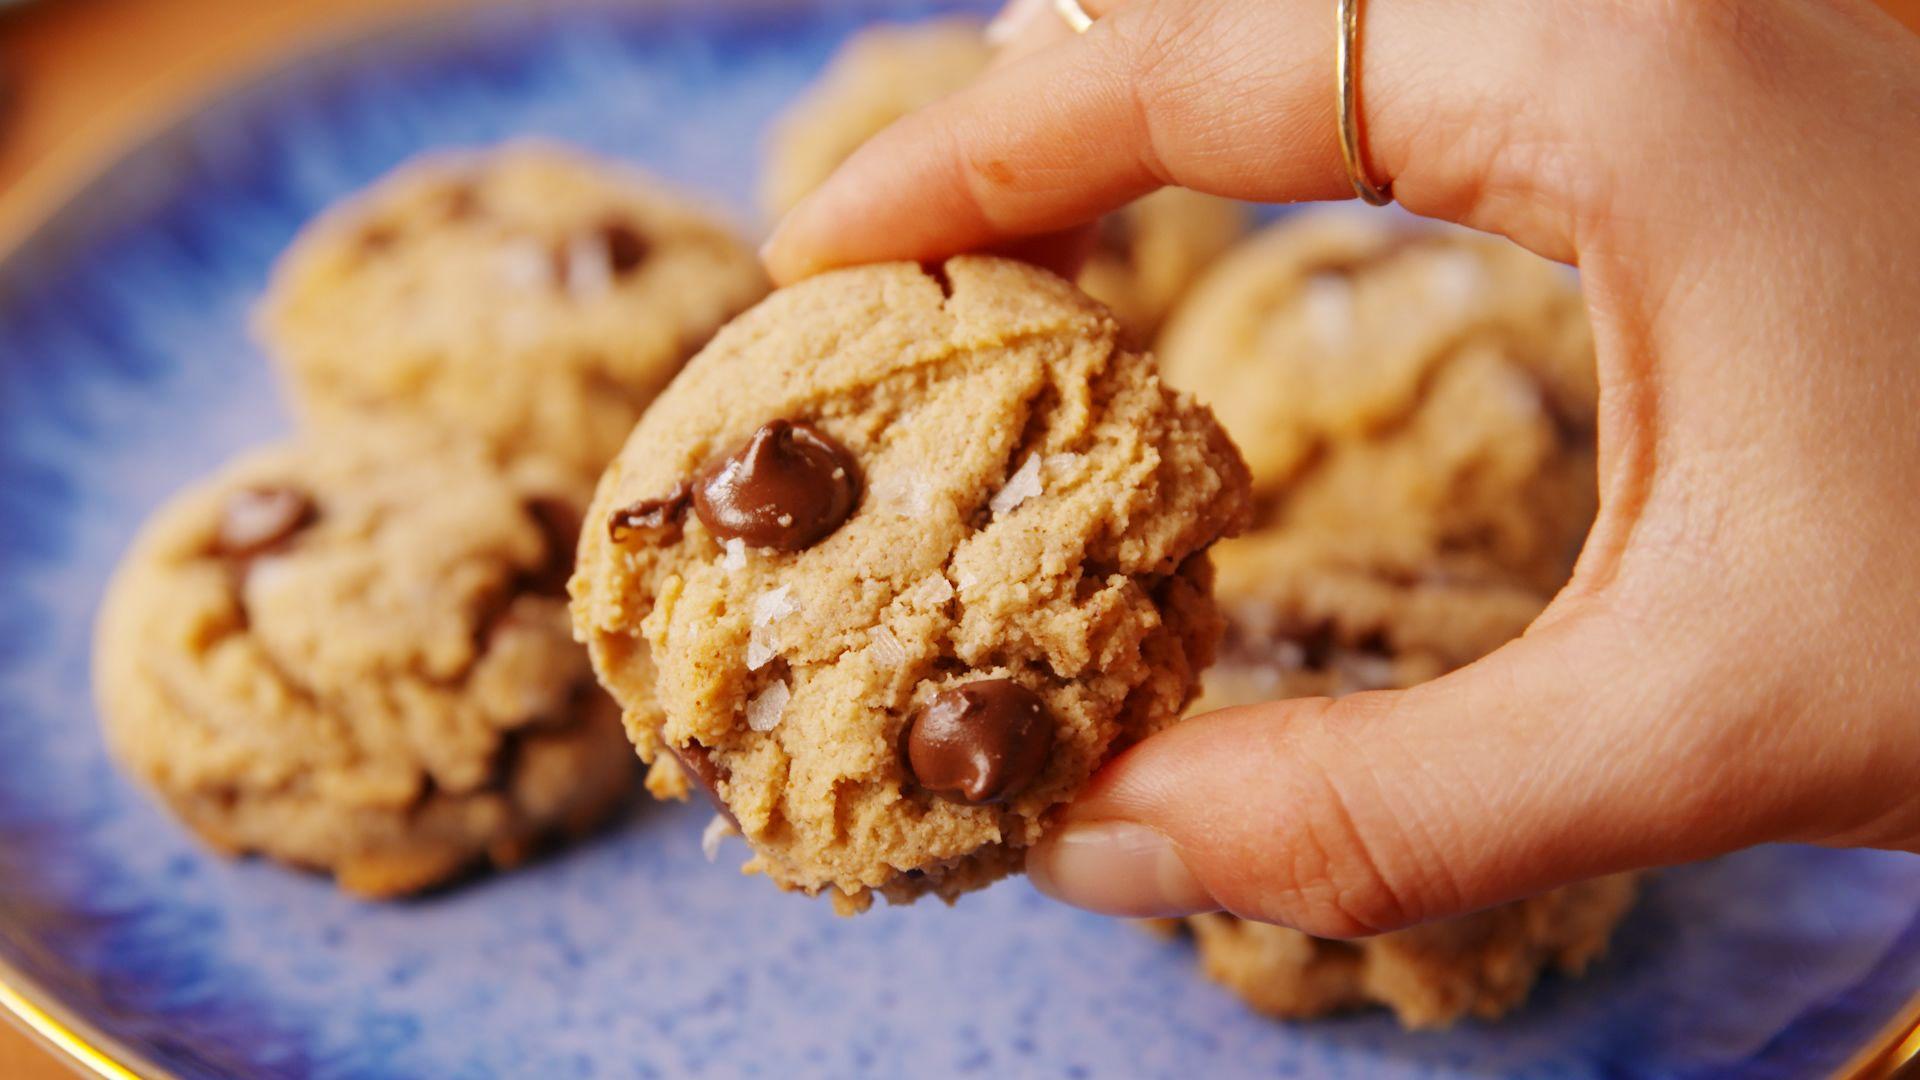 Best Paleo Chocolate Chip Cookies Recipe How To Make Paleo